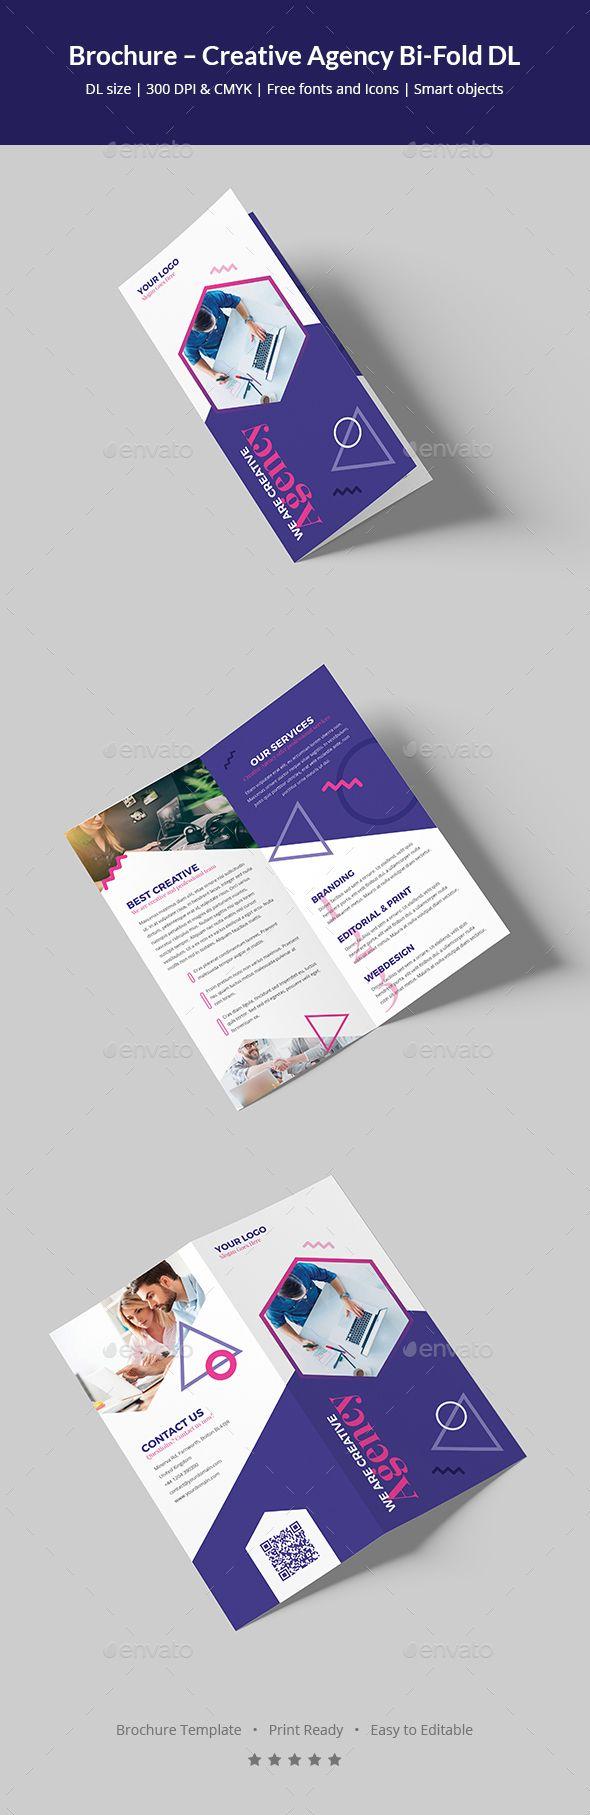 Brochure Creative Agency BiFold DL Brochure Templates - Dl size flyer template